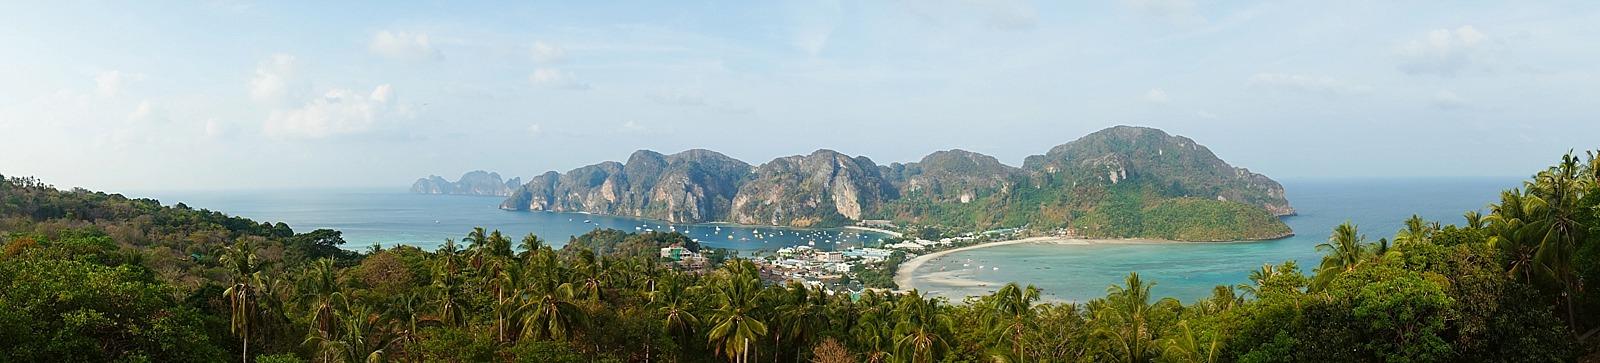 Thailand-diana-elizabeth-travel-blogger-phoenix-koh-ko-phi-phi-island-522